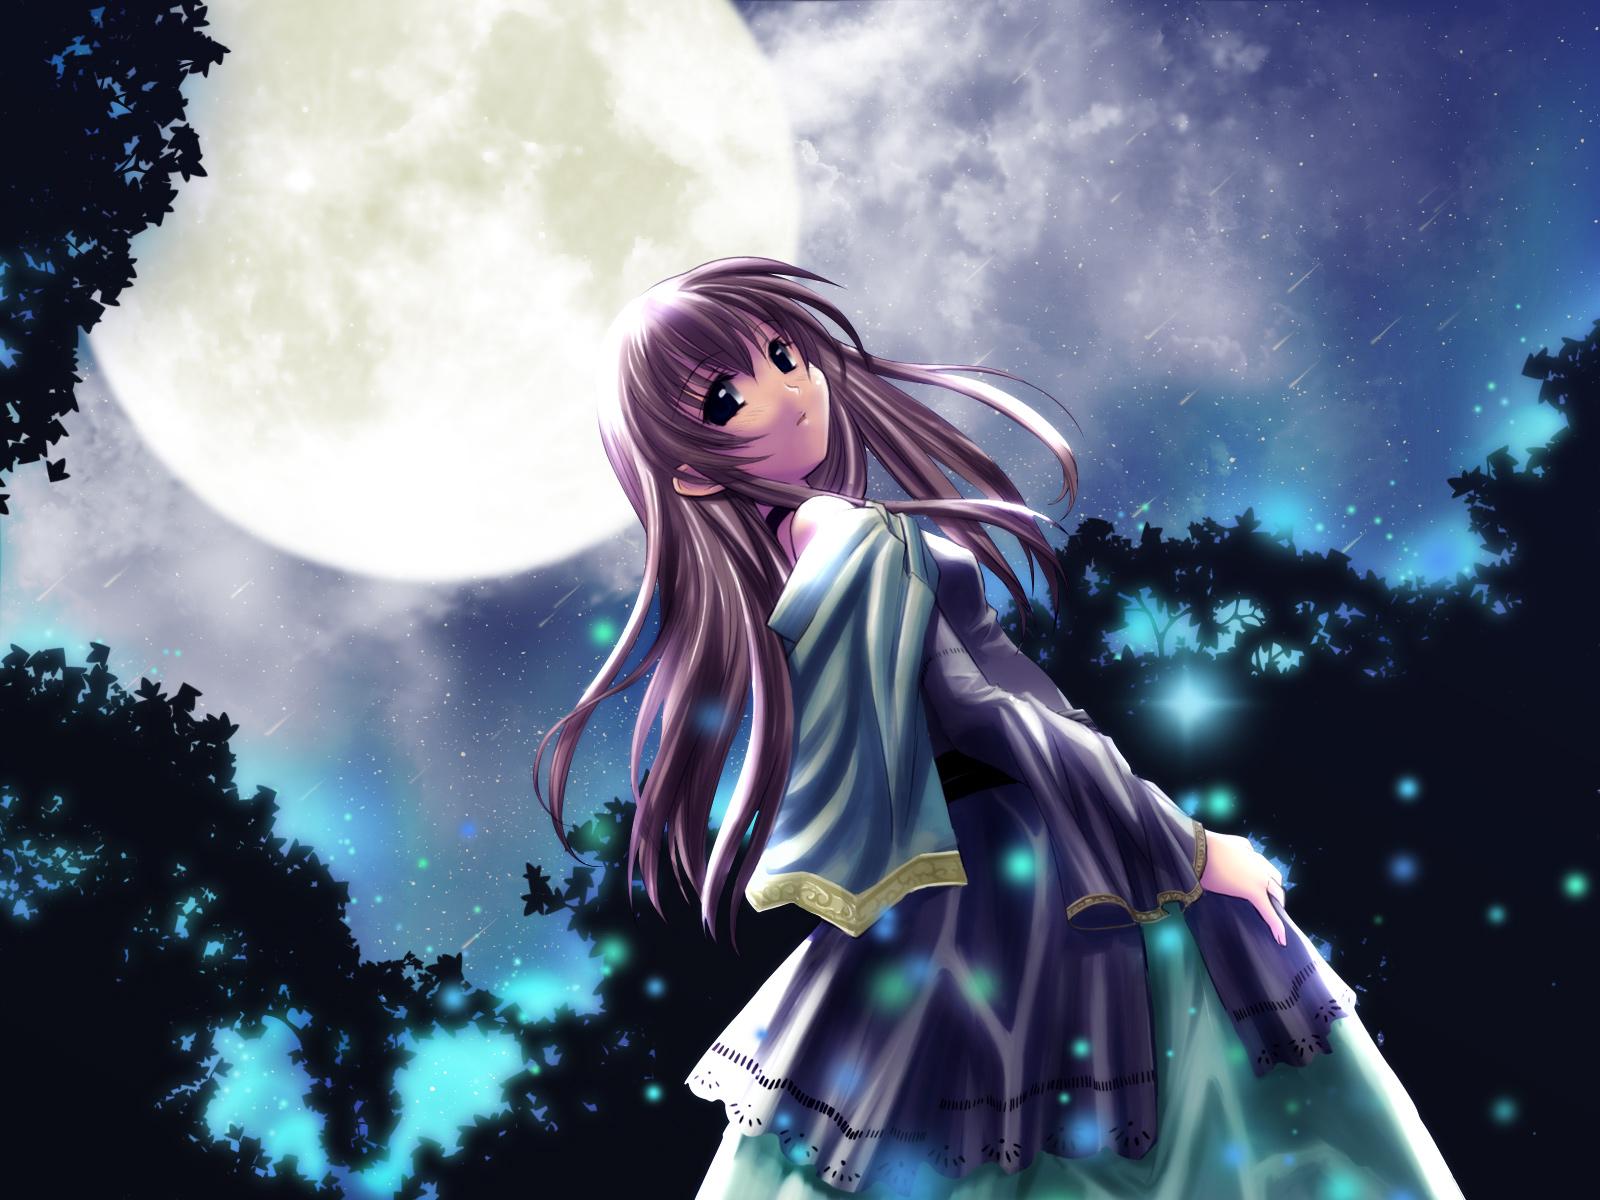 wallpaper best anime - photo #14